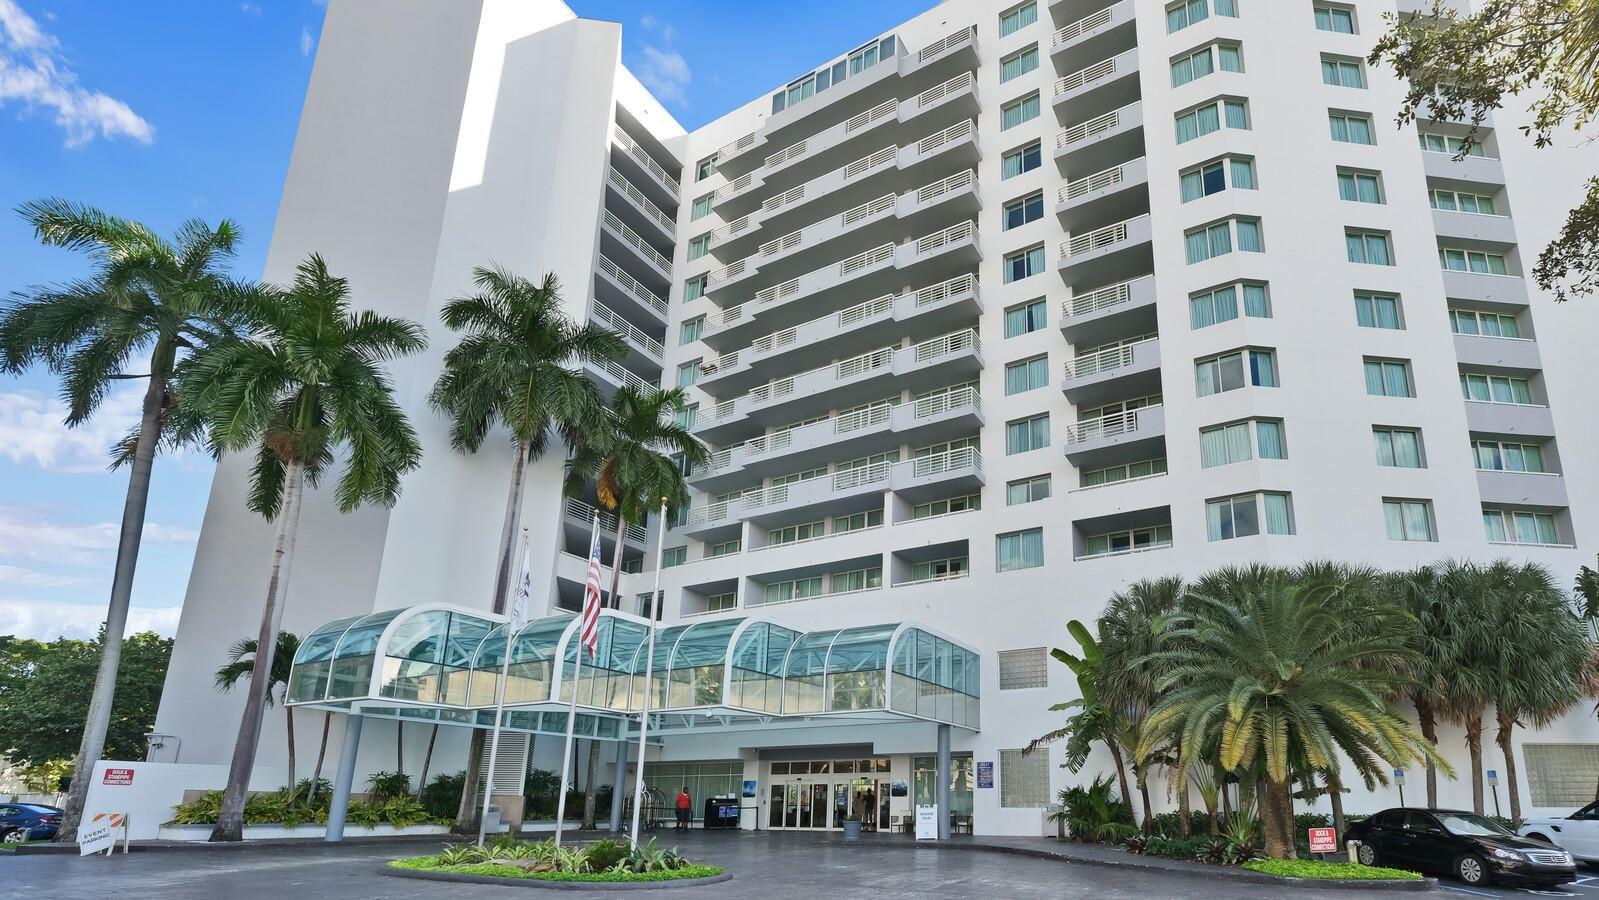 2670 E Sunrise Boulevard #405, Fort Lauderdale, FL 33304 - #: RX-10668441